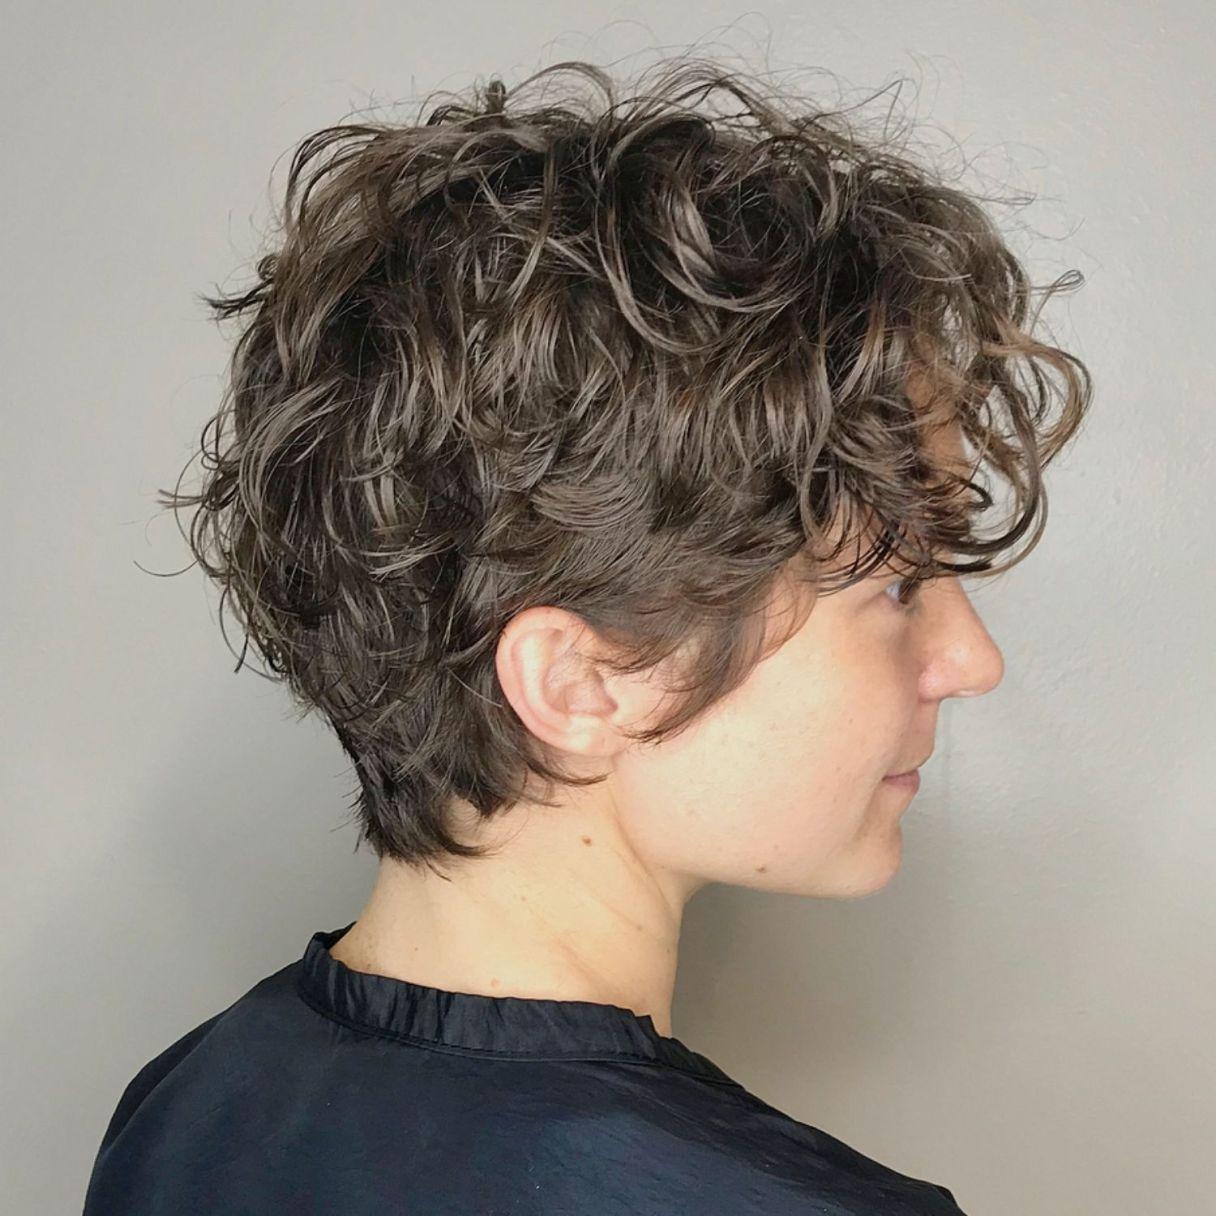 12 Most Delightful Short Wavy Hairstyles  Short wavy hair, Curly